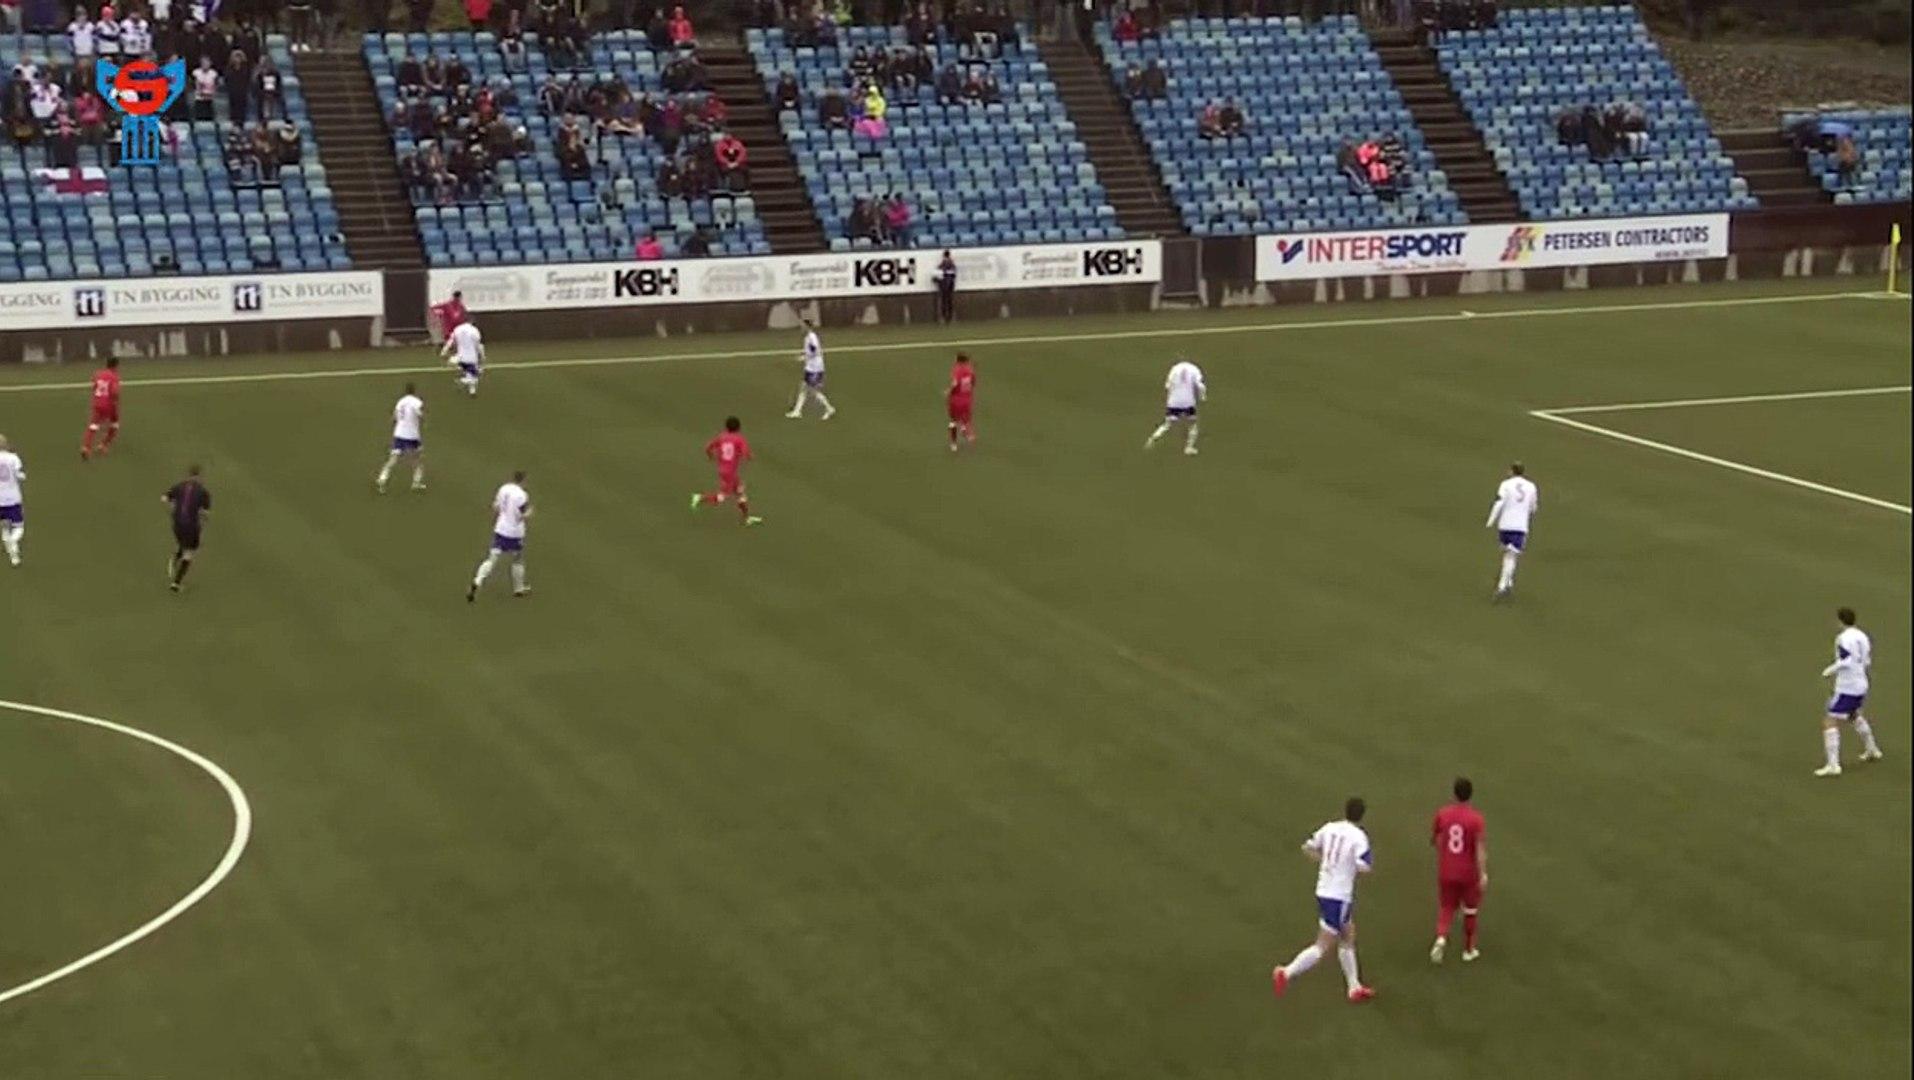 Faroe Islands 0 - 1 Azerbaijan Highlights HD 17.06.2015 (U21 European Championship)